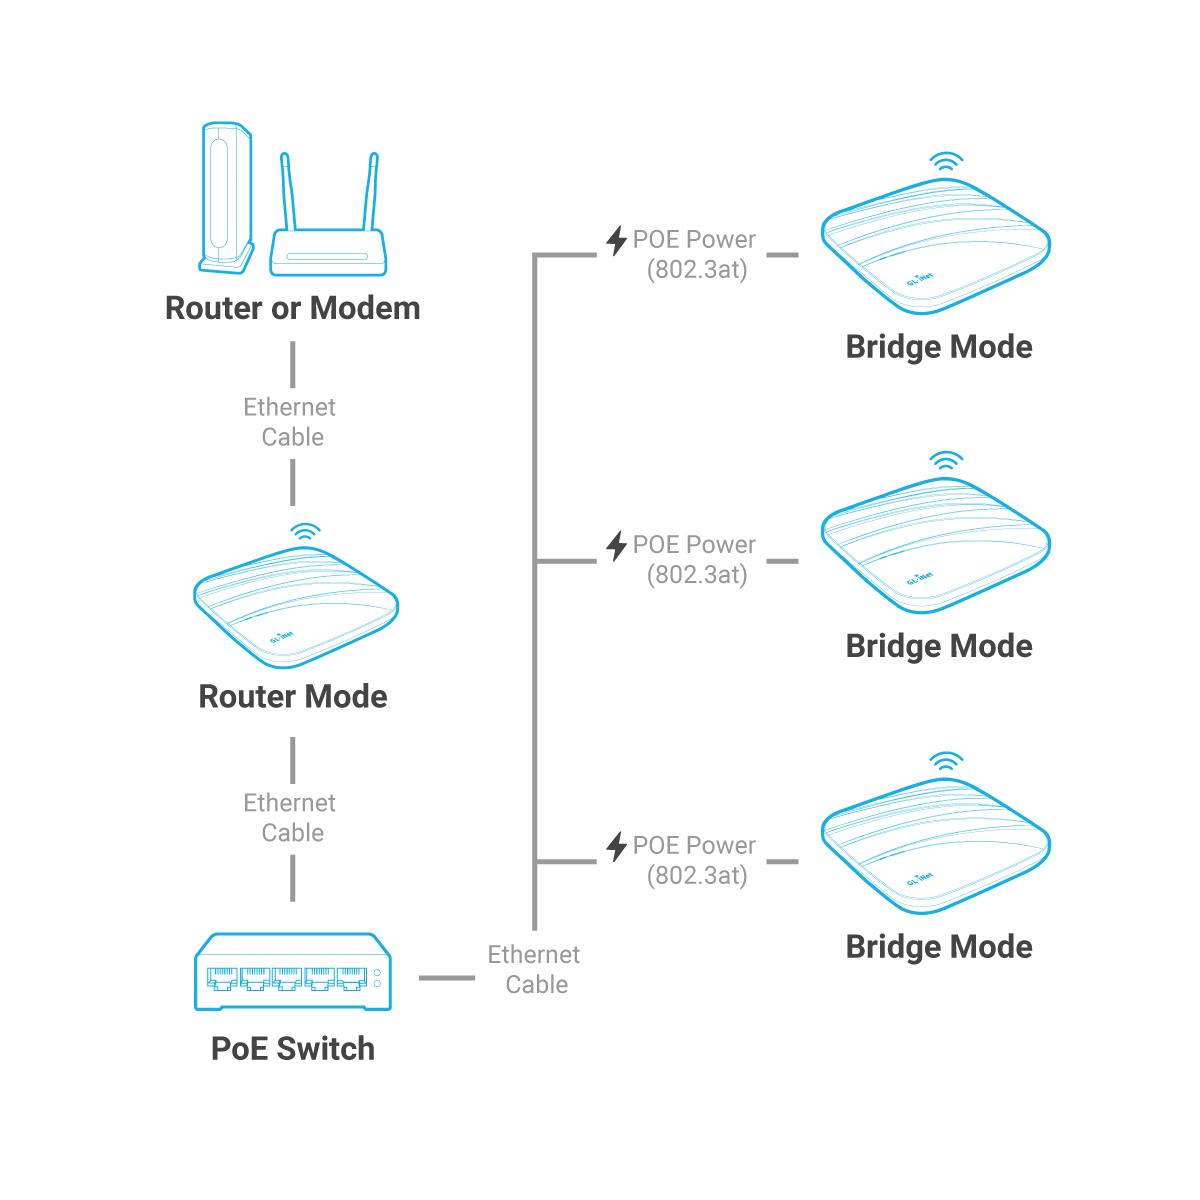 Multiple Device Deployment in Bridge Mode